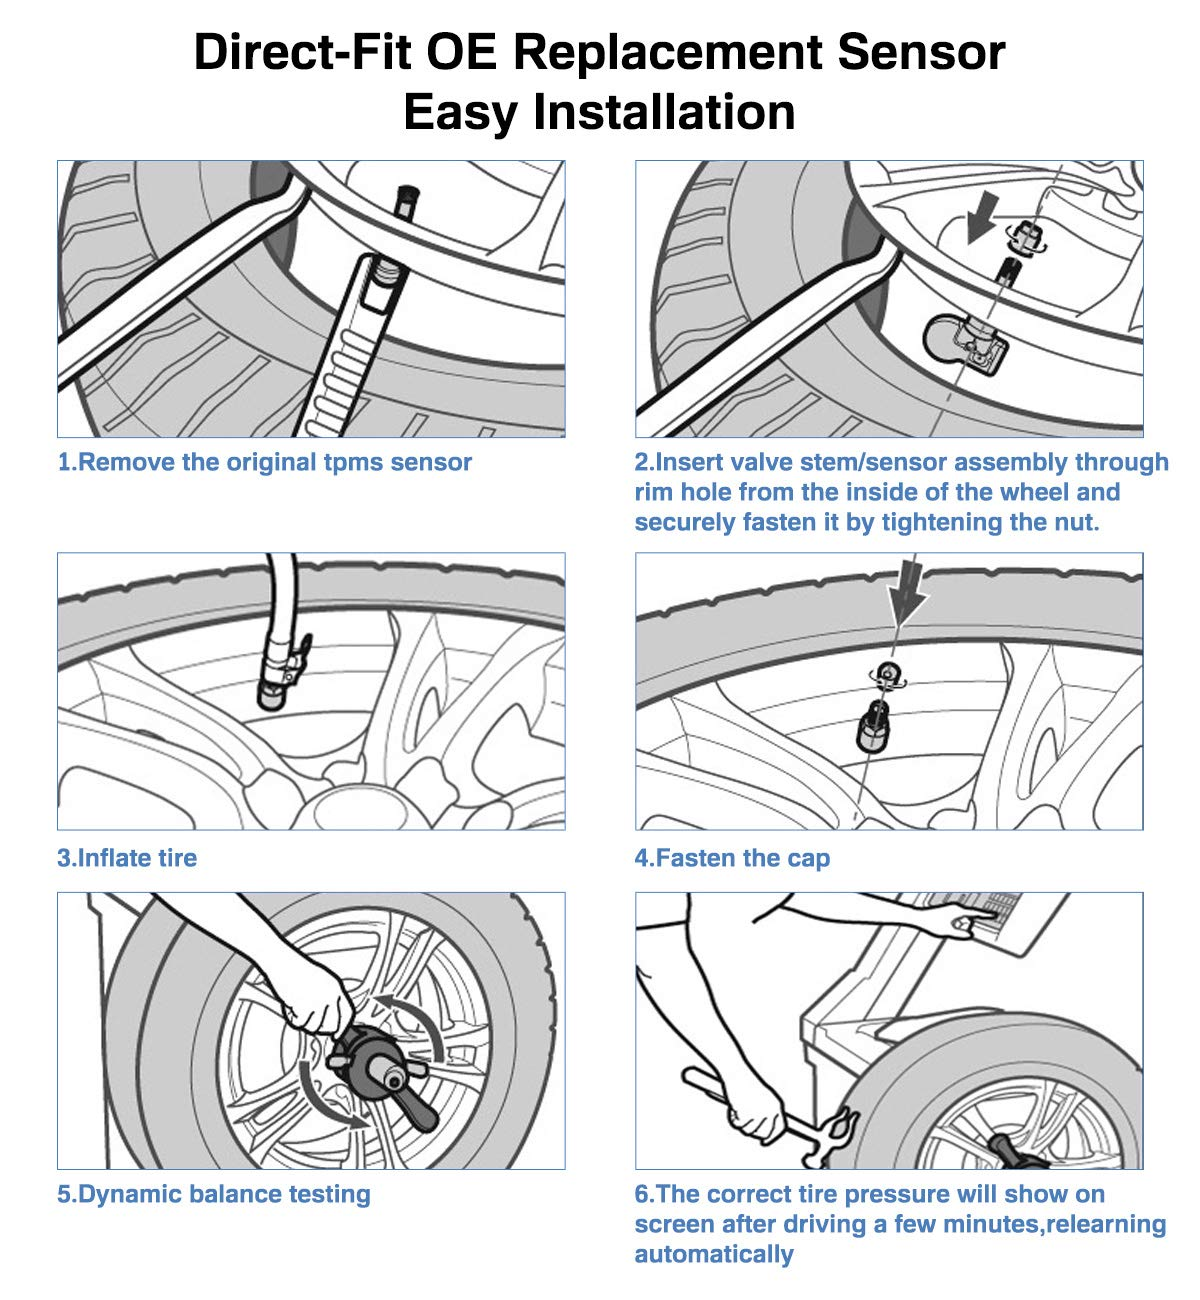 HOTSTSTEM 13586335,13598771,15922396,20923680,25799331,Tire Pressure Monitoring Sensor TPMS 315HMz for Buick Chevrolet Cadillac GMC Pontiac Saturn Suzuki Hummer 4-pack